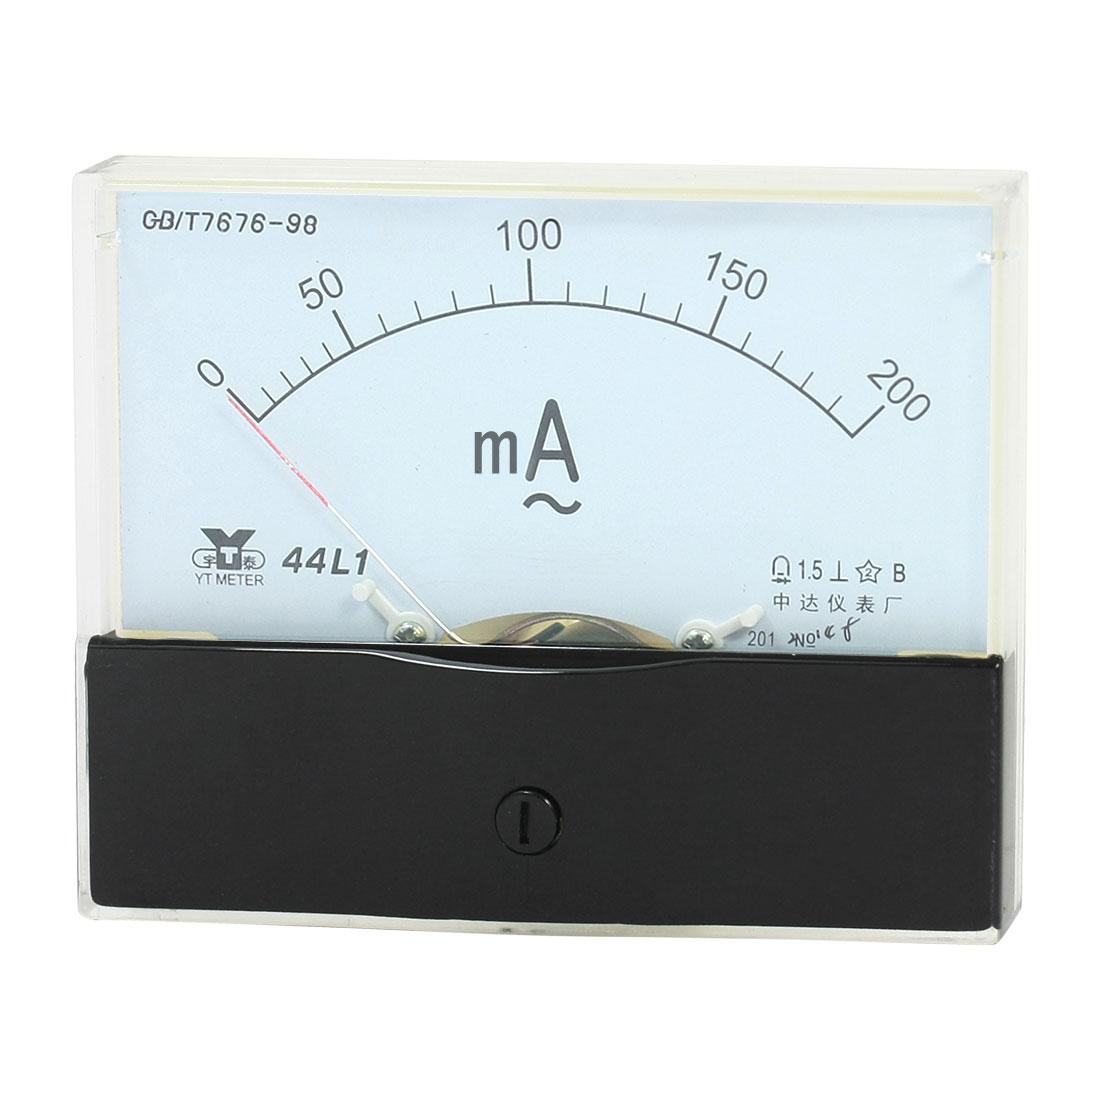 Measurement Tool Panel Mount Analog Ammeter Gauge AC 0 - 200mA Measuring Range 44L1